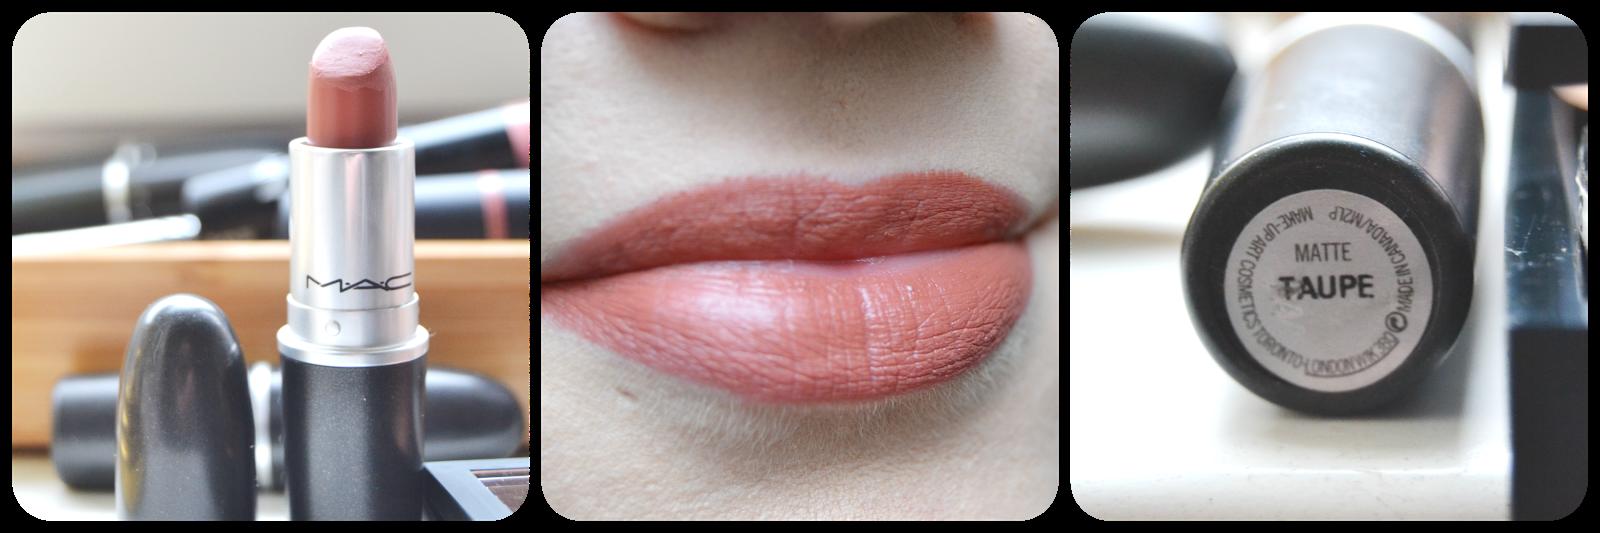 Mac, Cosmetics, Lipstick, Lippenstift, Swatch, Taupe, Swatches, Lipswatch, Matte